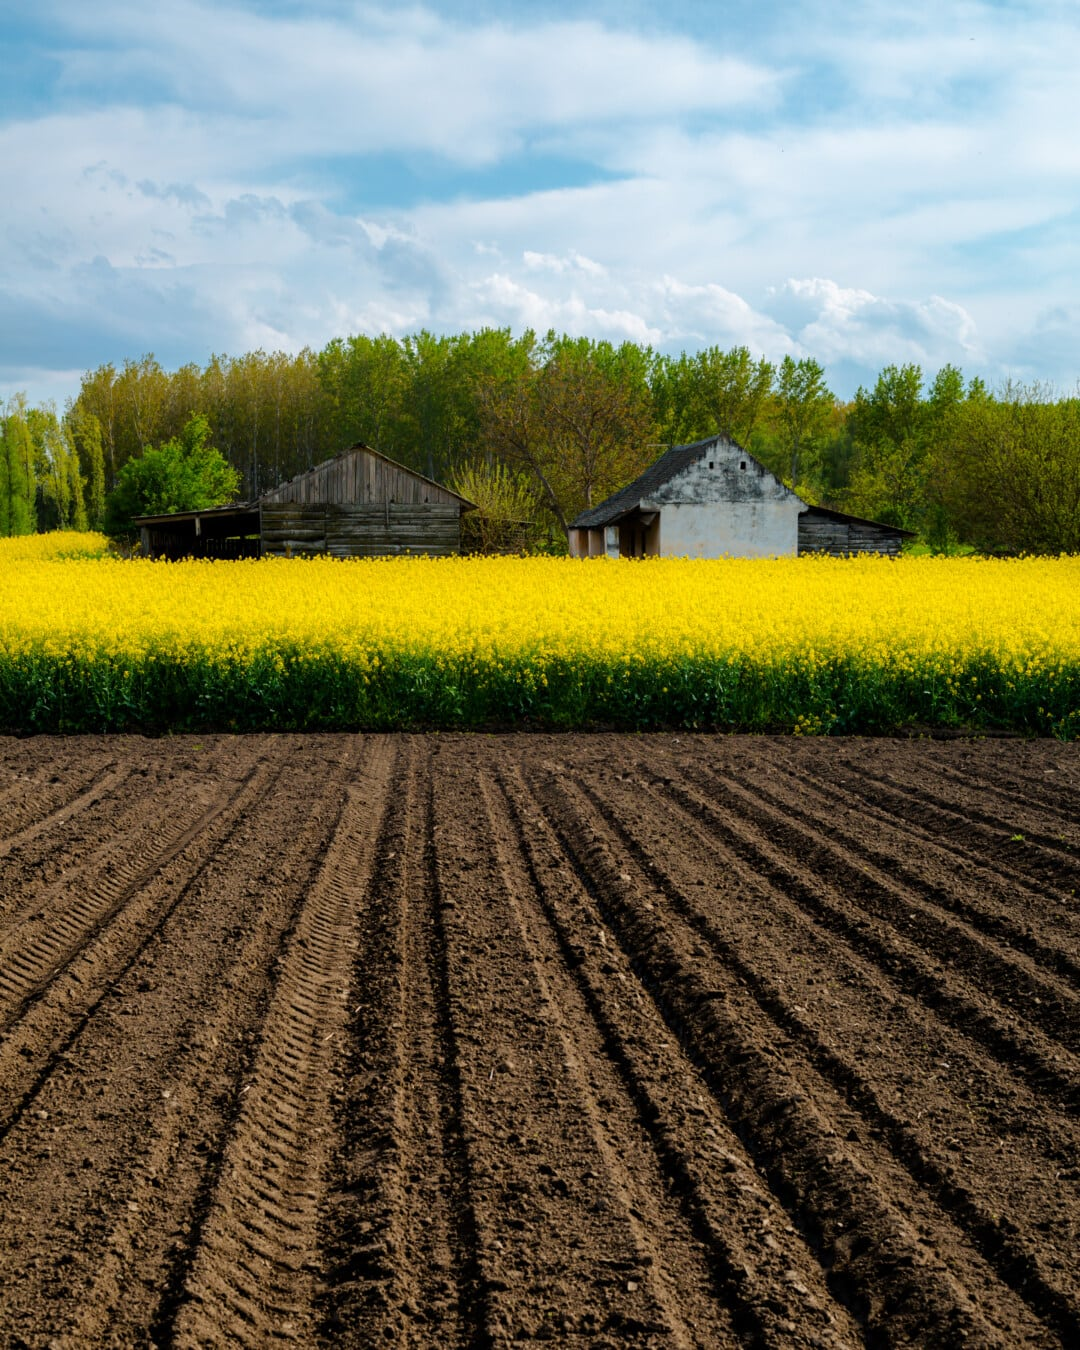 agricole, domaine, Agriculture, les terres agricoles, ferme, Agriculture, rural, ferme, paysage, colza